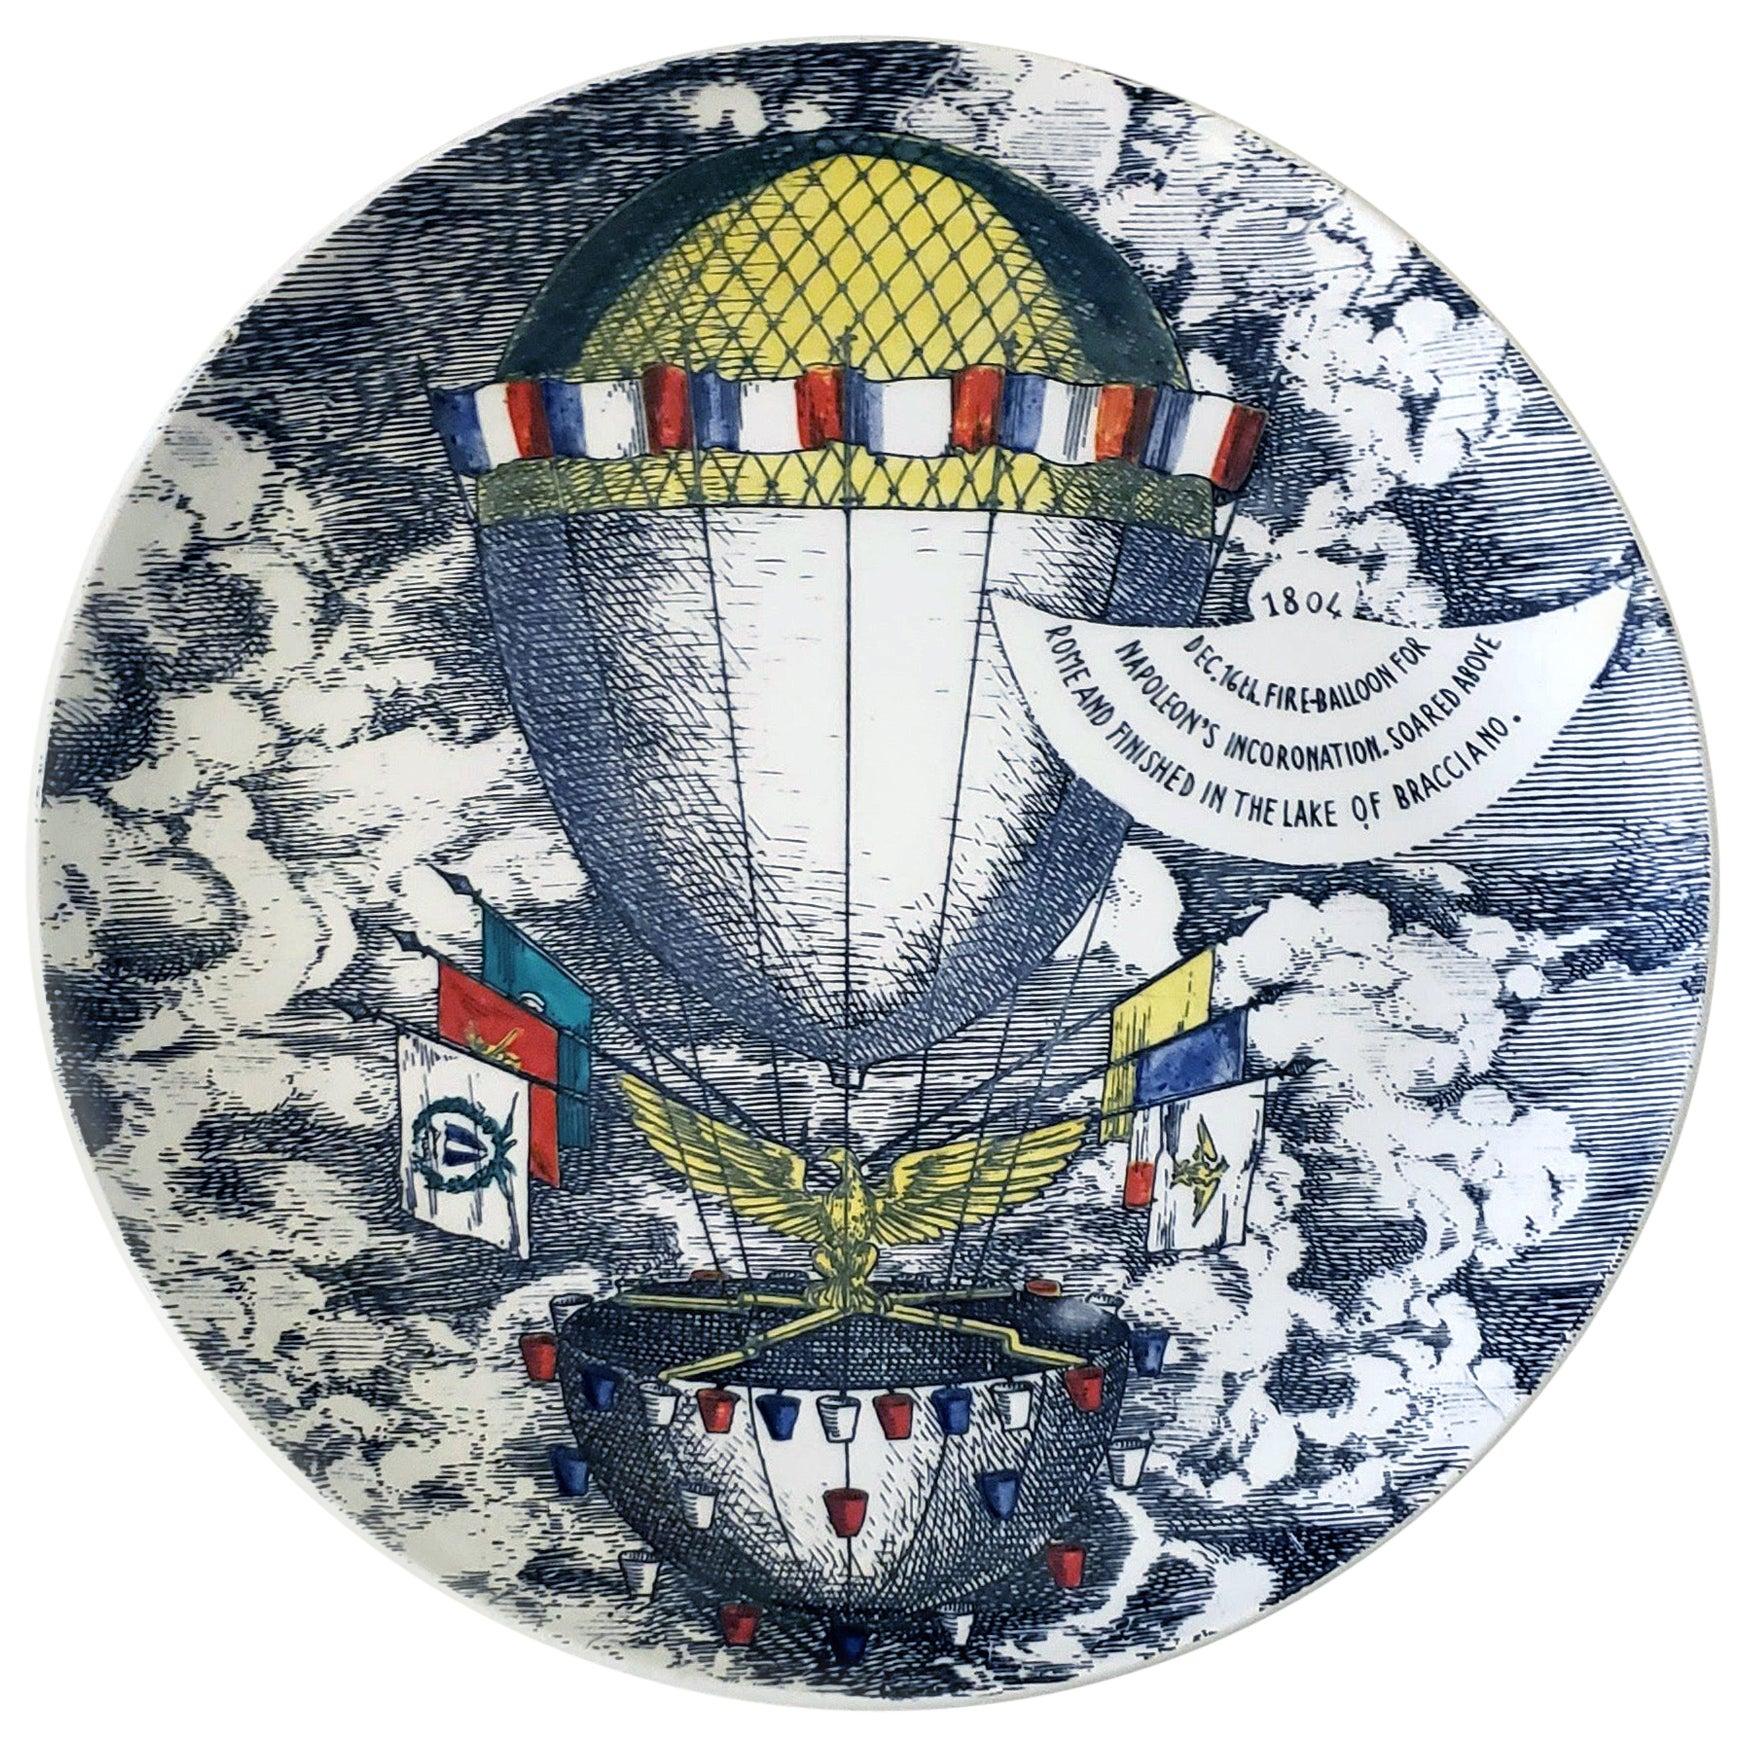 Vintage Piero Fornasetti Plate, Mongolfiere 'hot air' Design